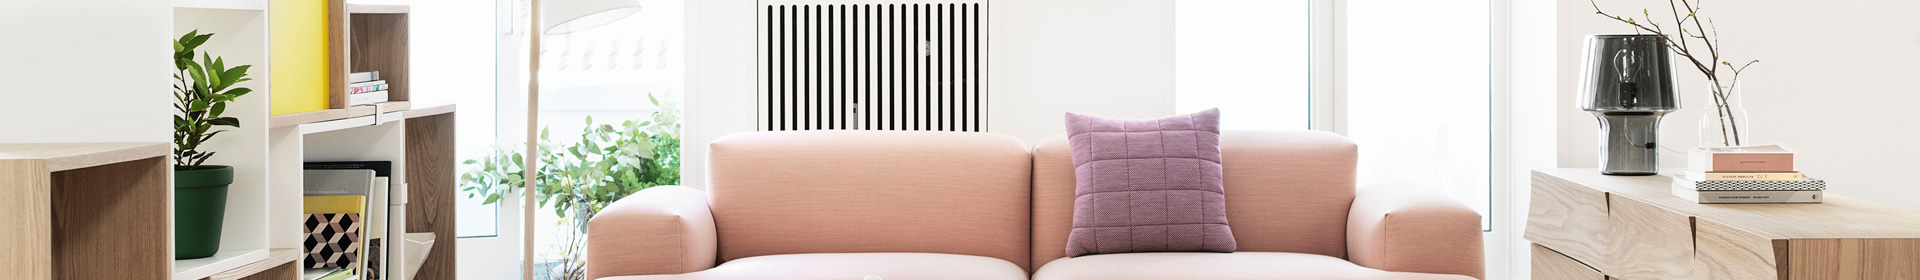 Arredamento per la tua casa online shop on dtime for Shopping online arredamento